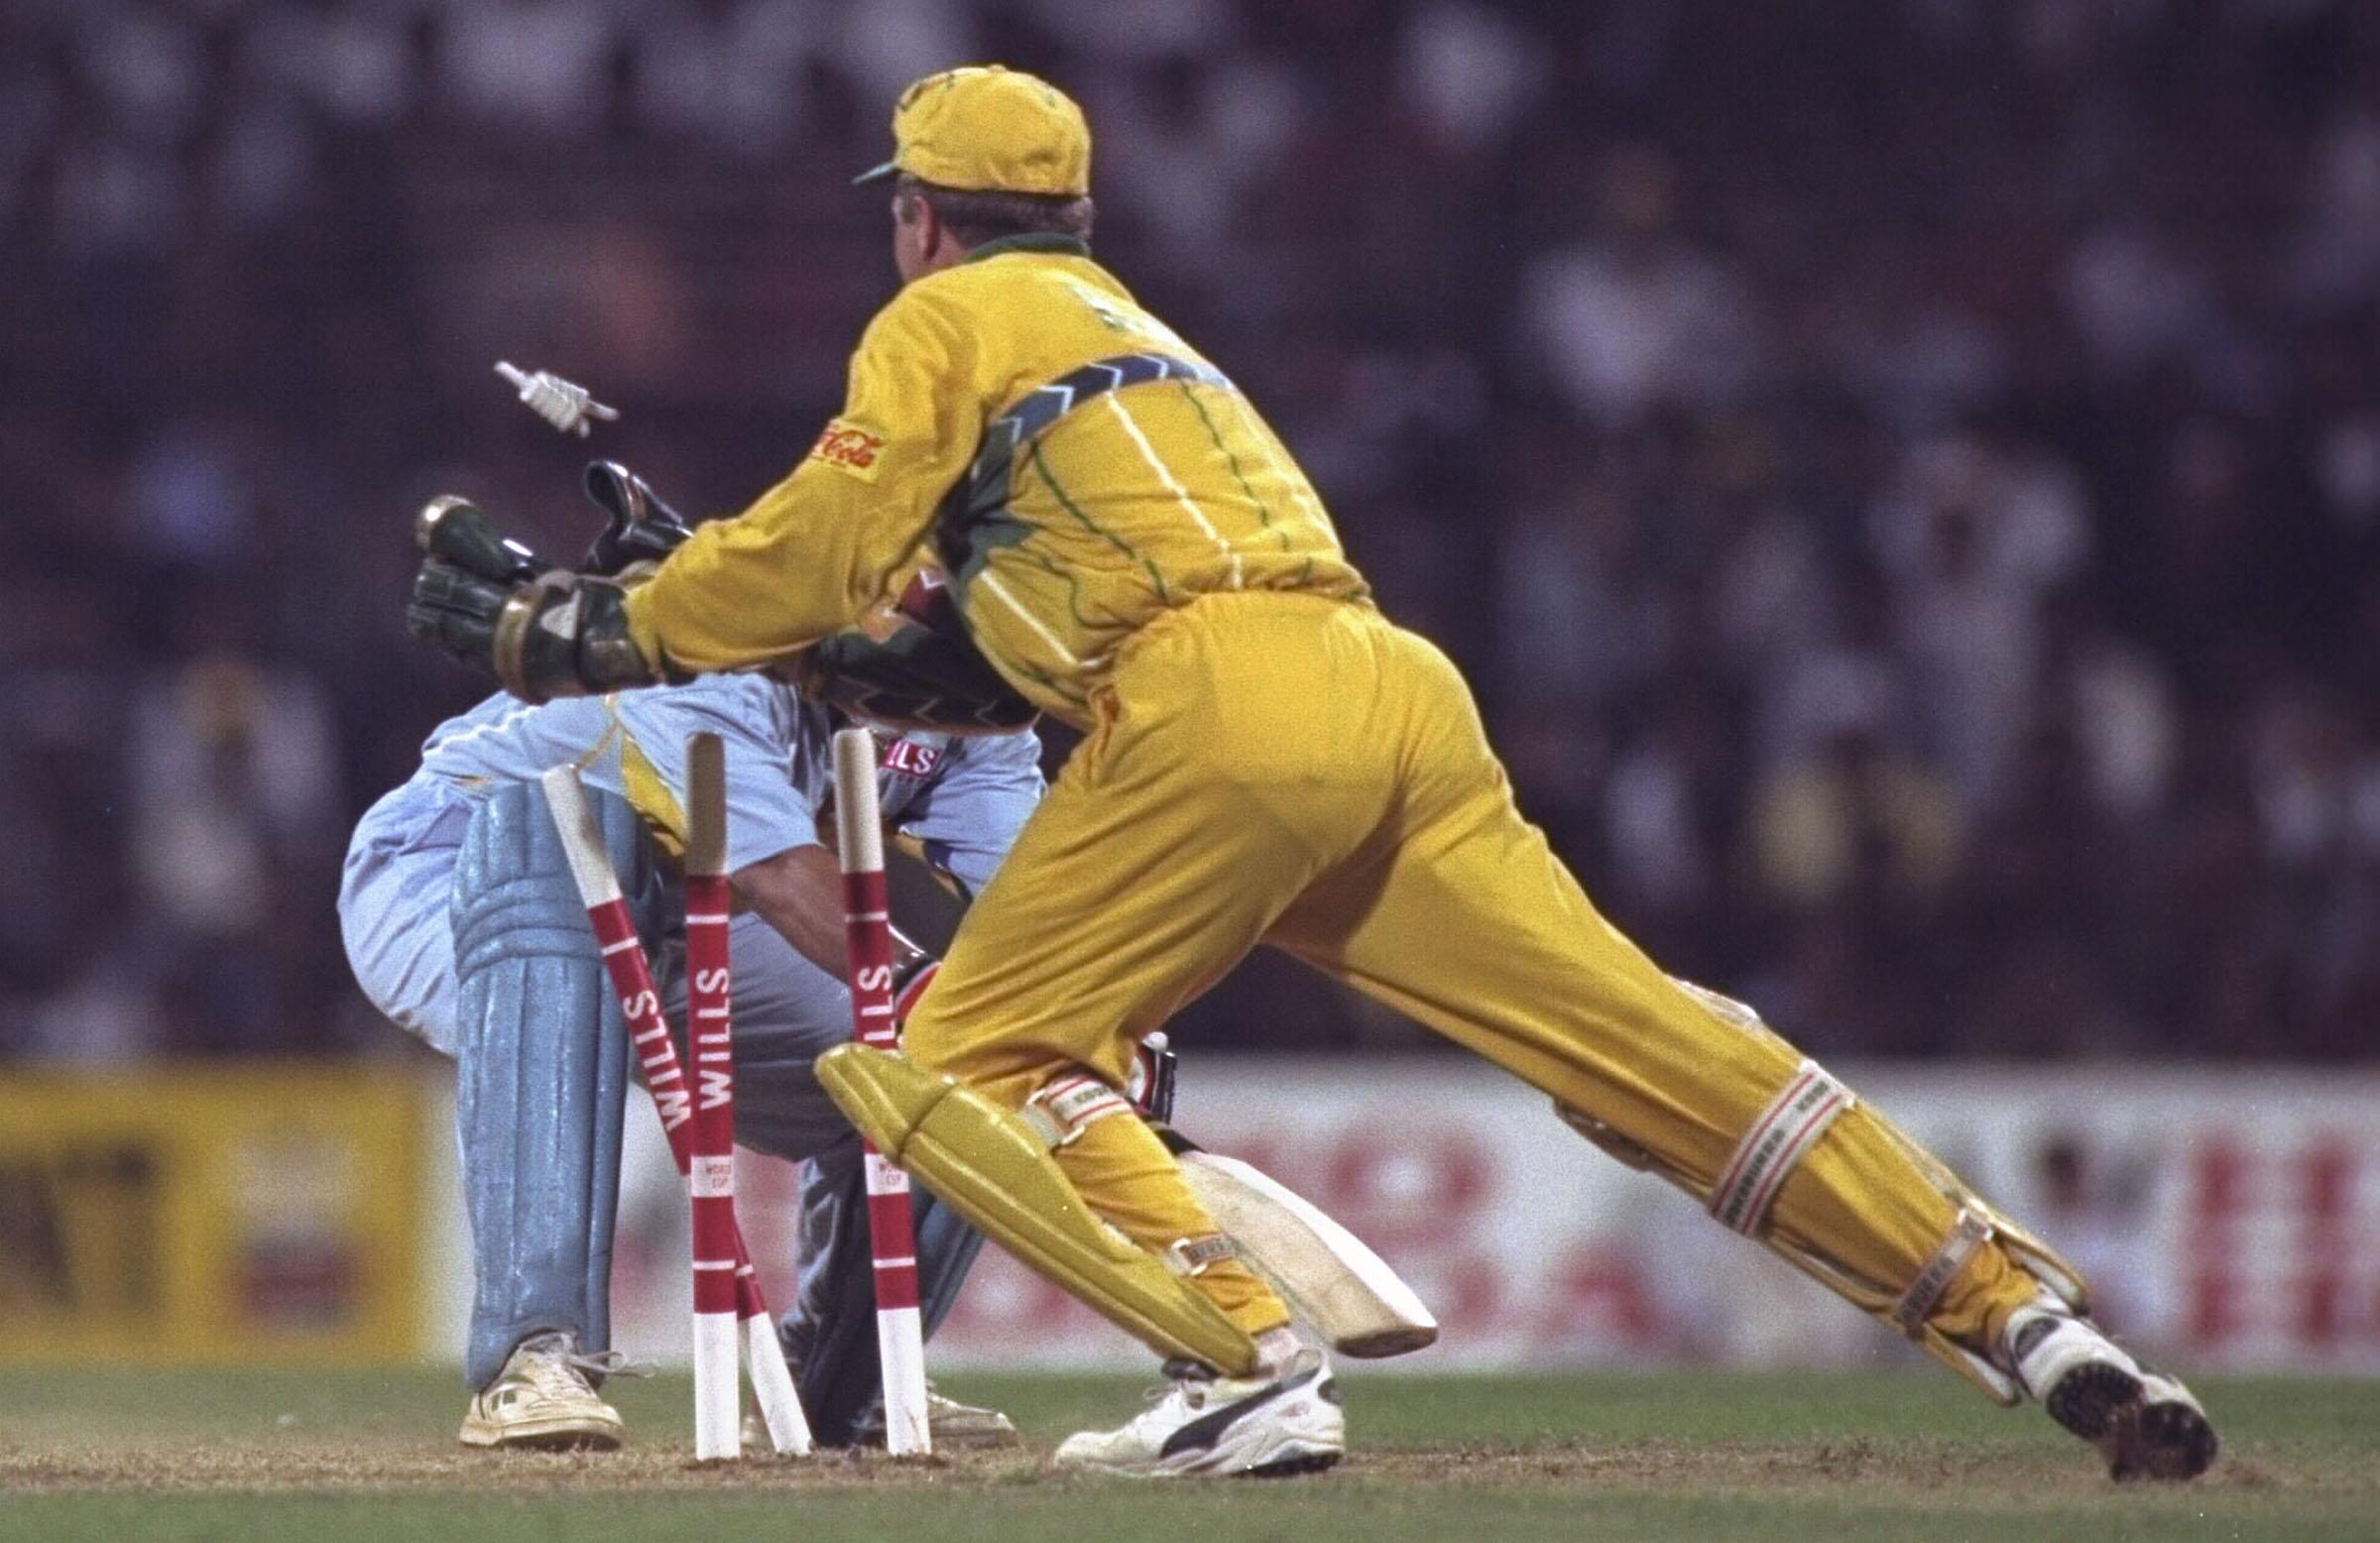 Healy stumps Sachin Tendulkar at the 1996 World Cup // Getty